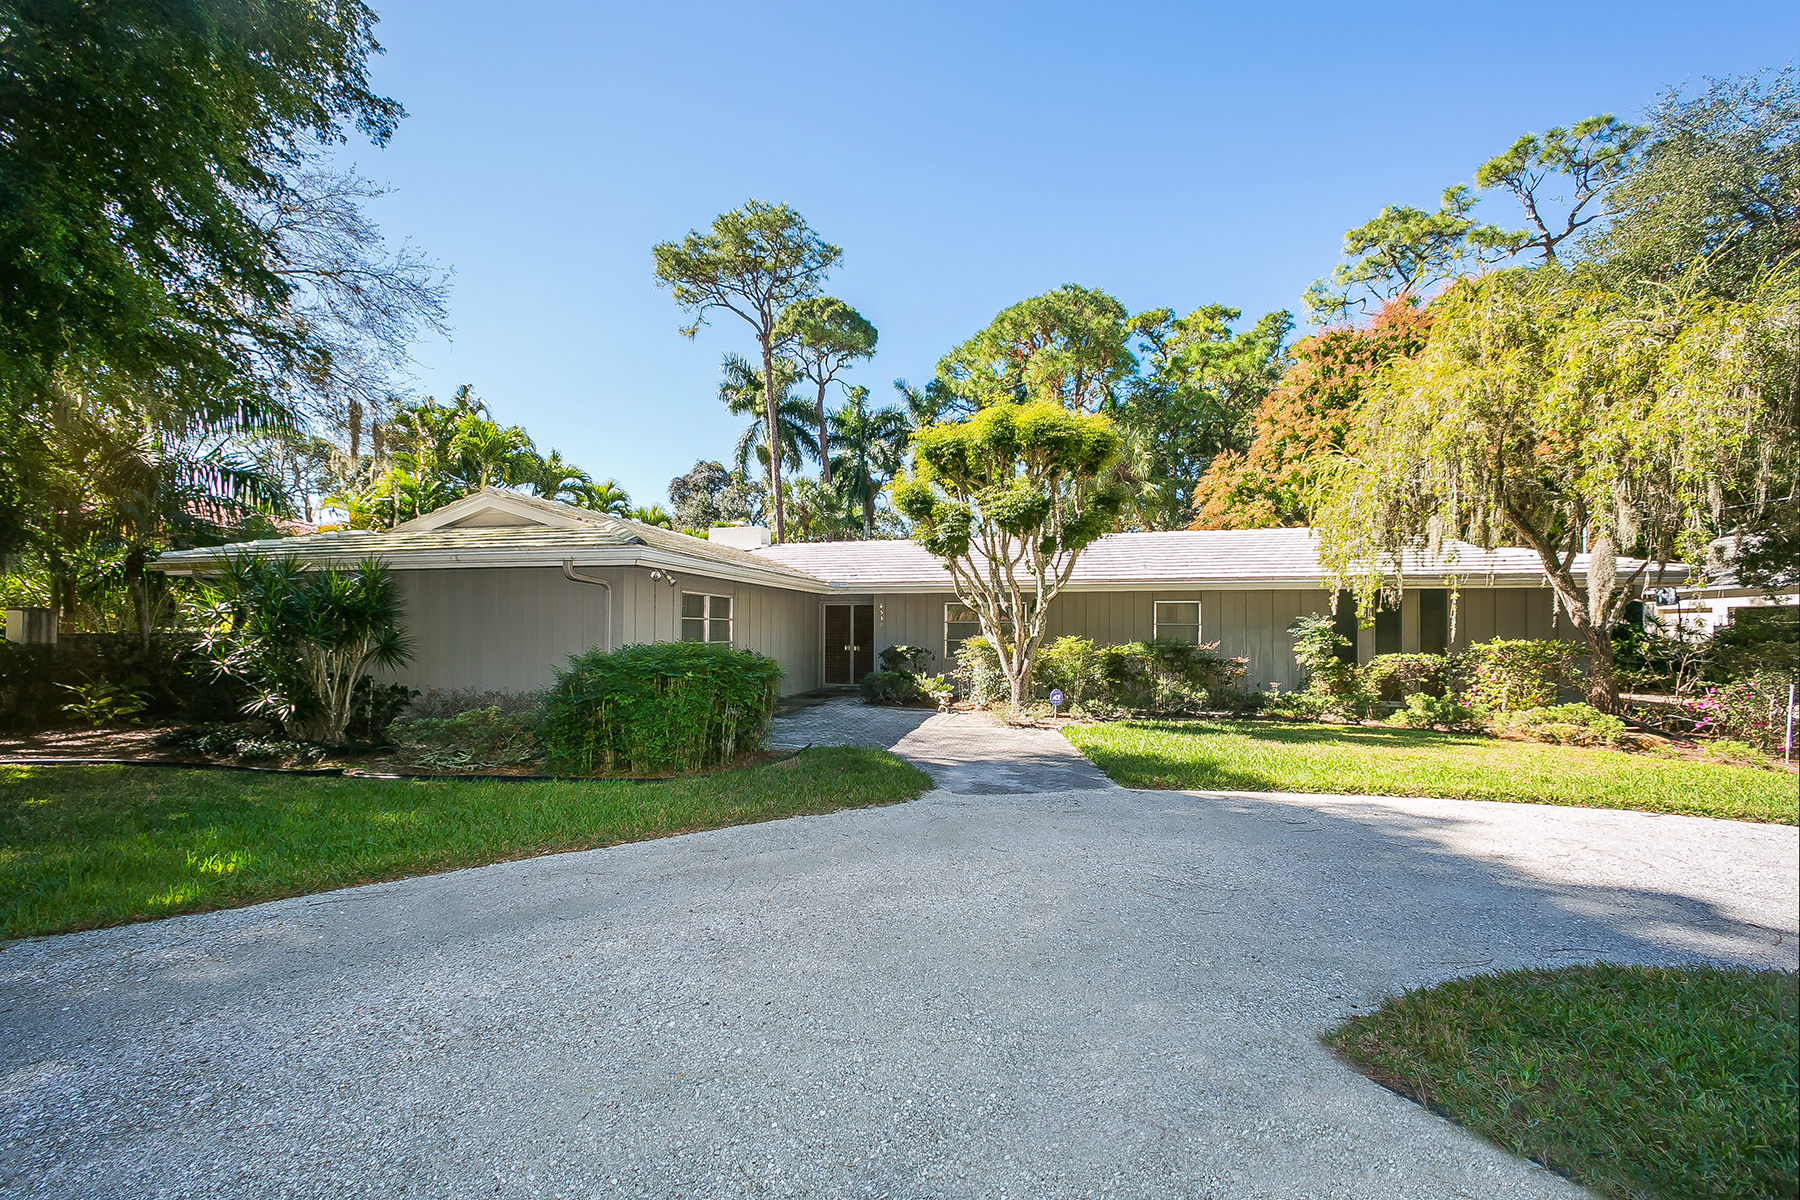 Single Family Home for Sale at SARASOTA 4530 Camino Real Sarasota, Florida, 34231 United States